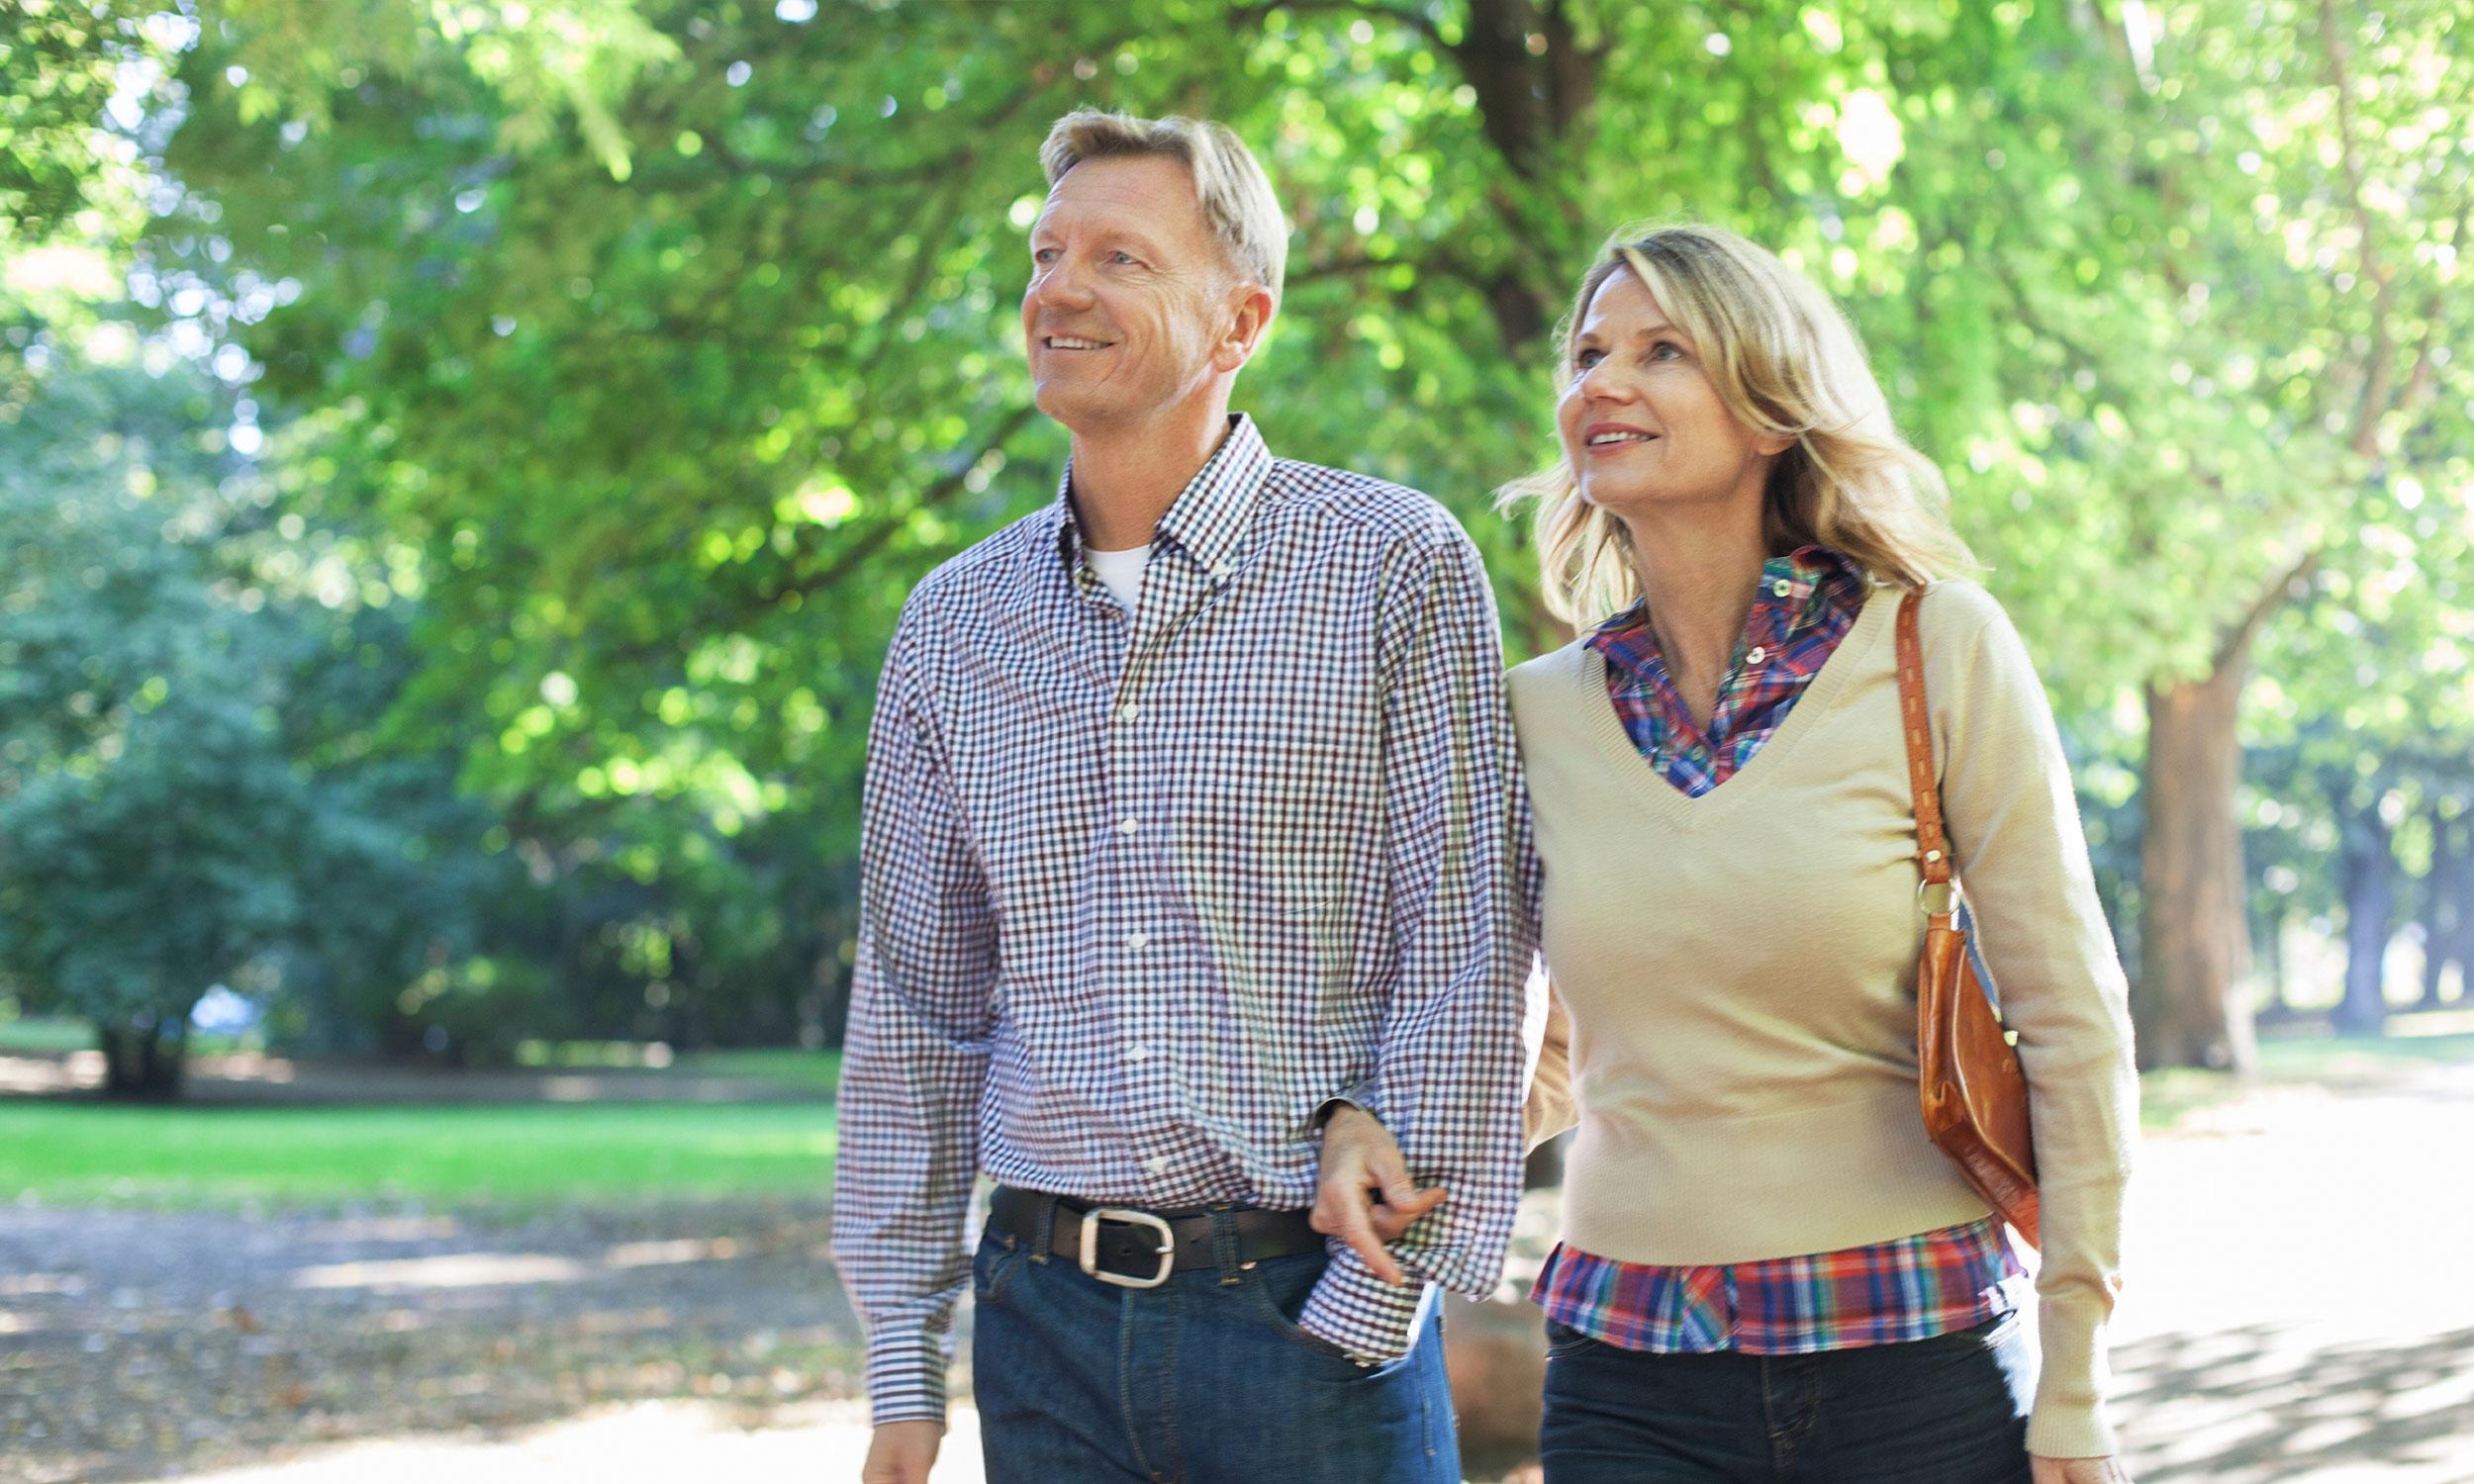 Couple-Happy-Walking.jpg